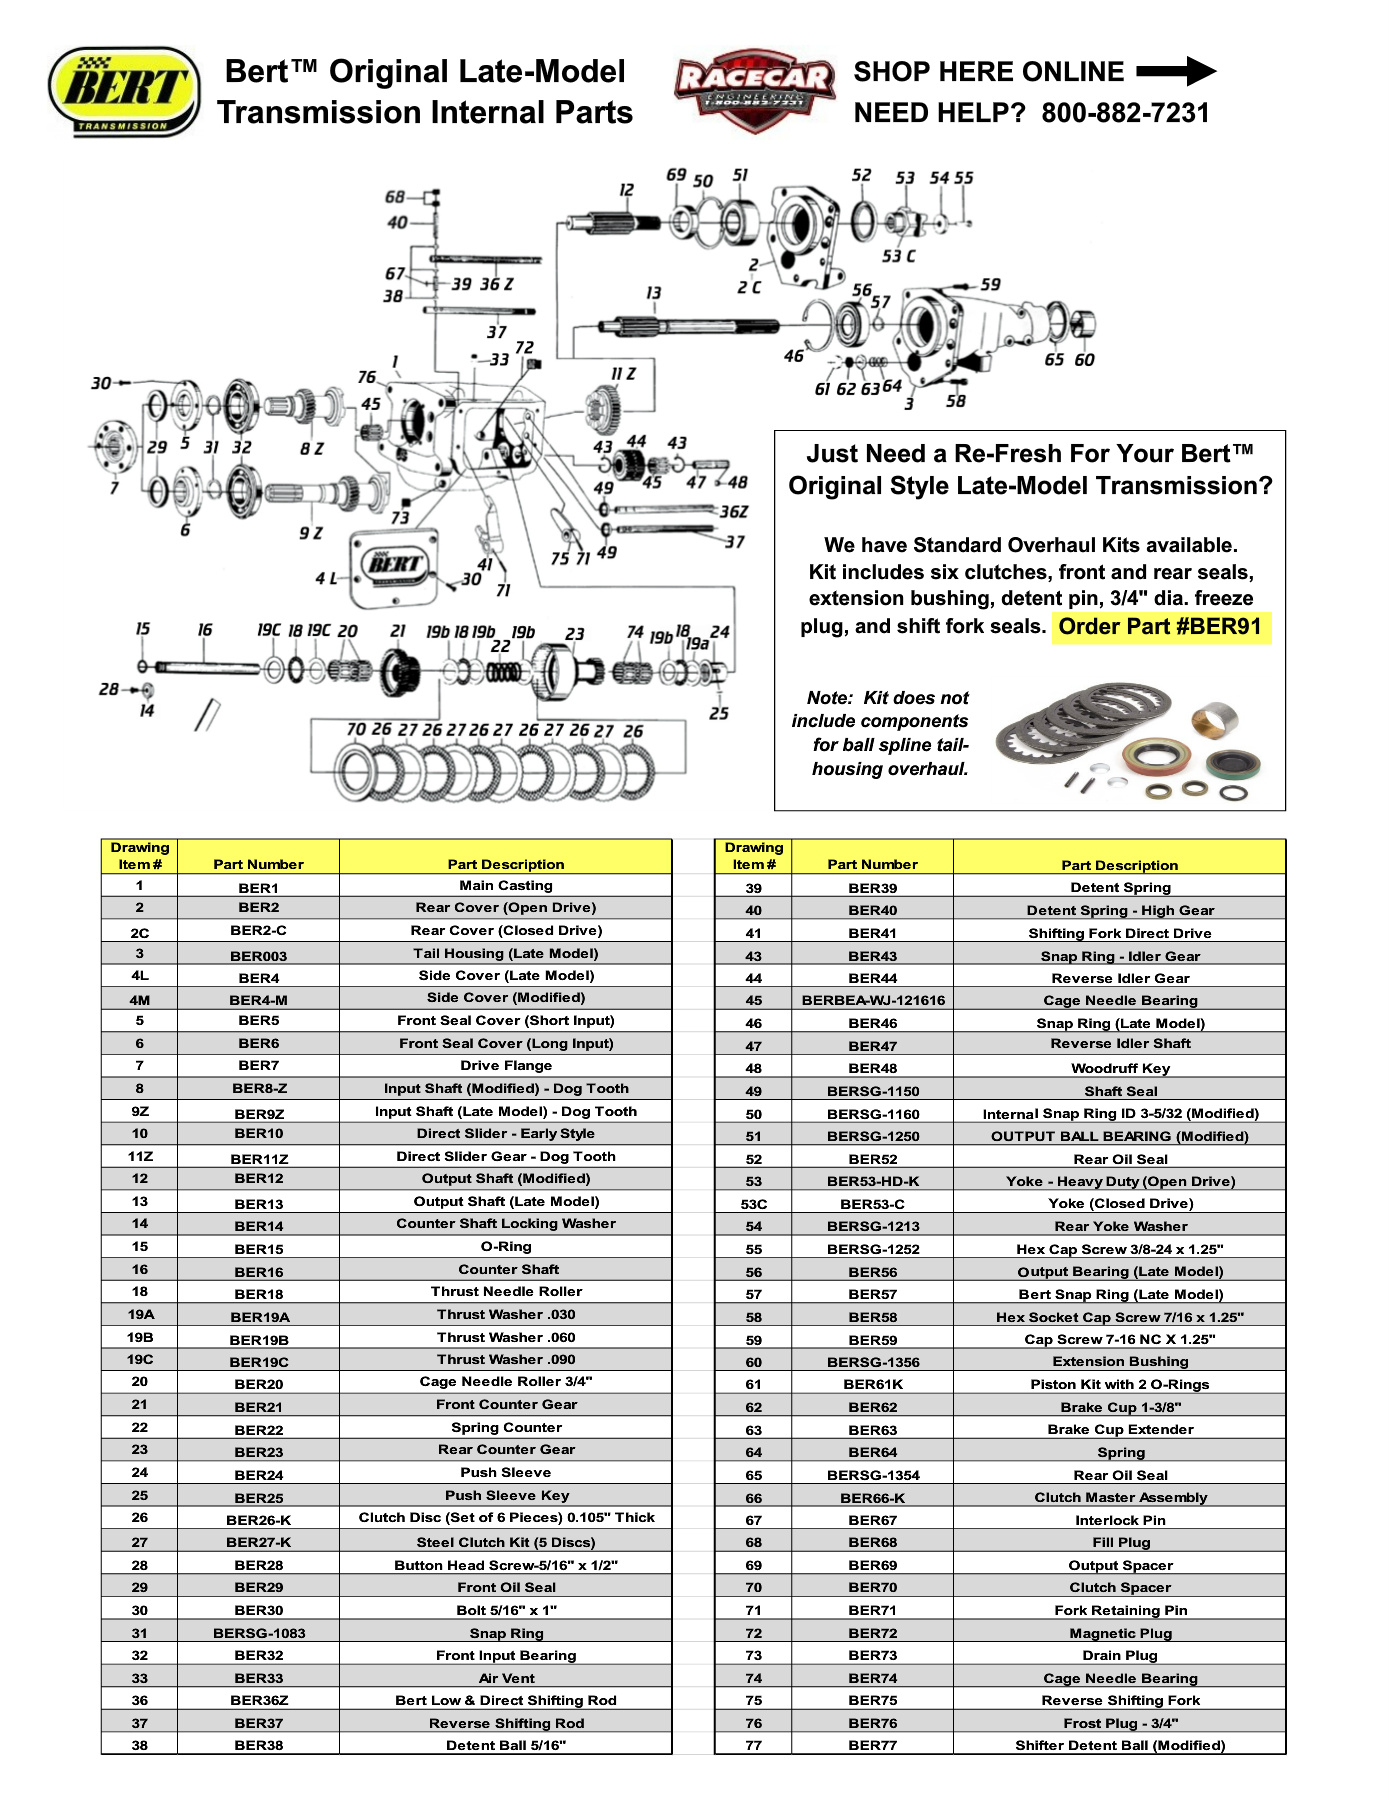 Tech-Transmission Bert Original Late-Model Exploded Parts